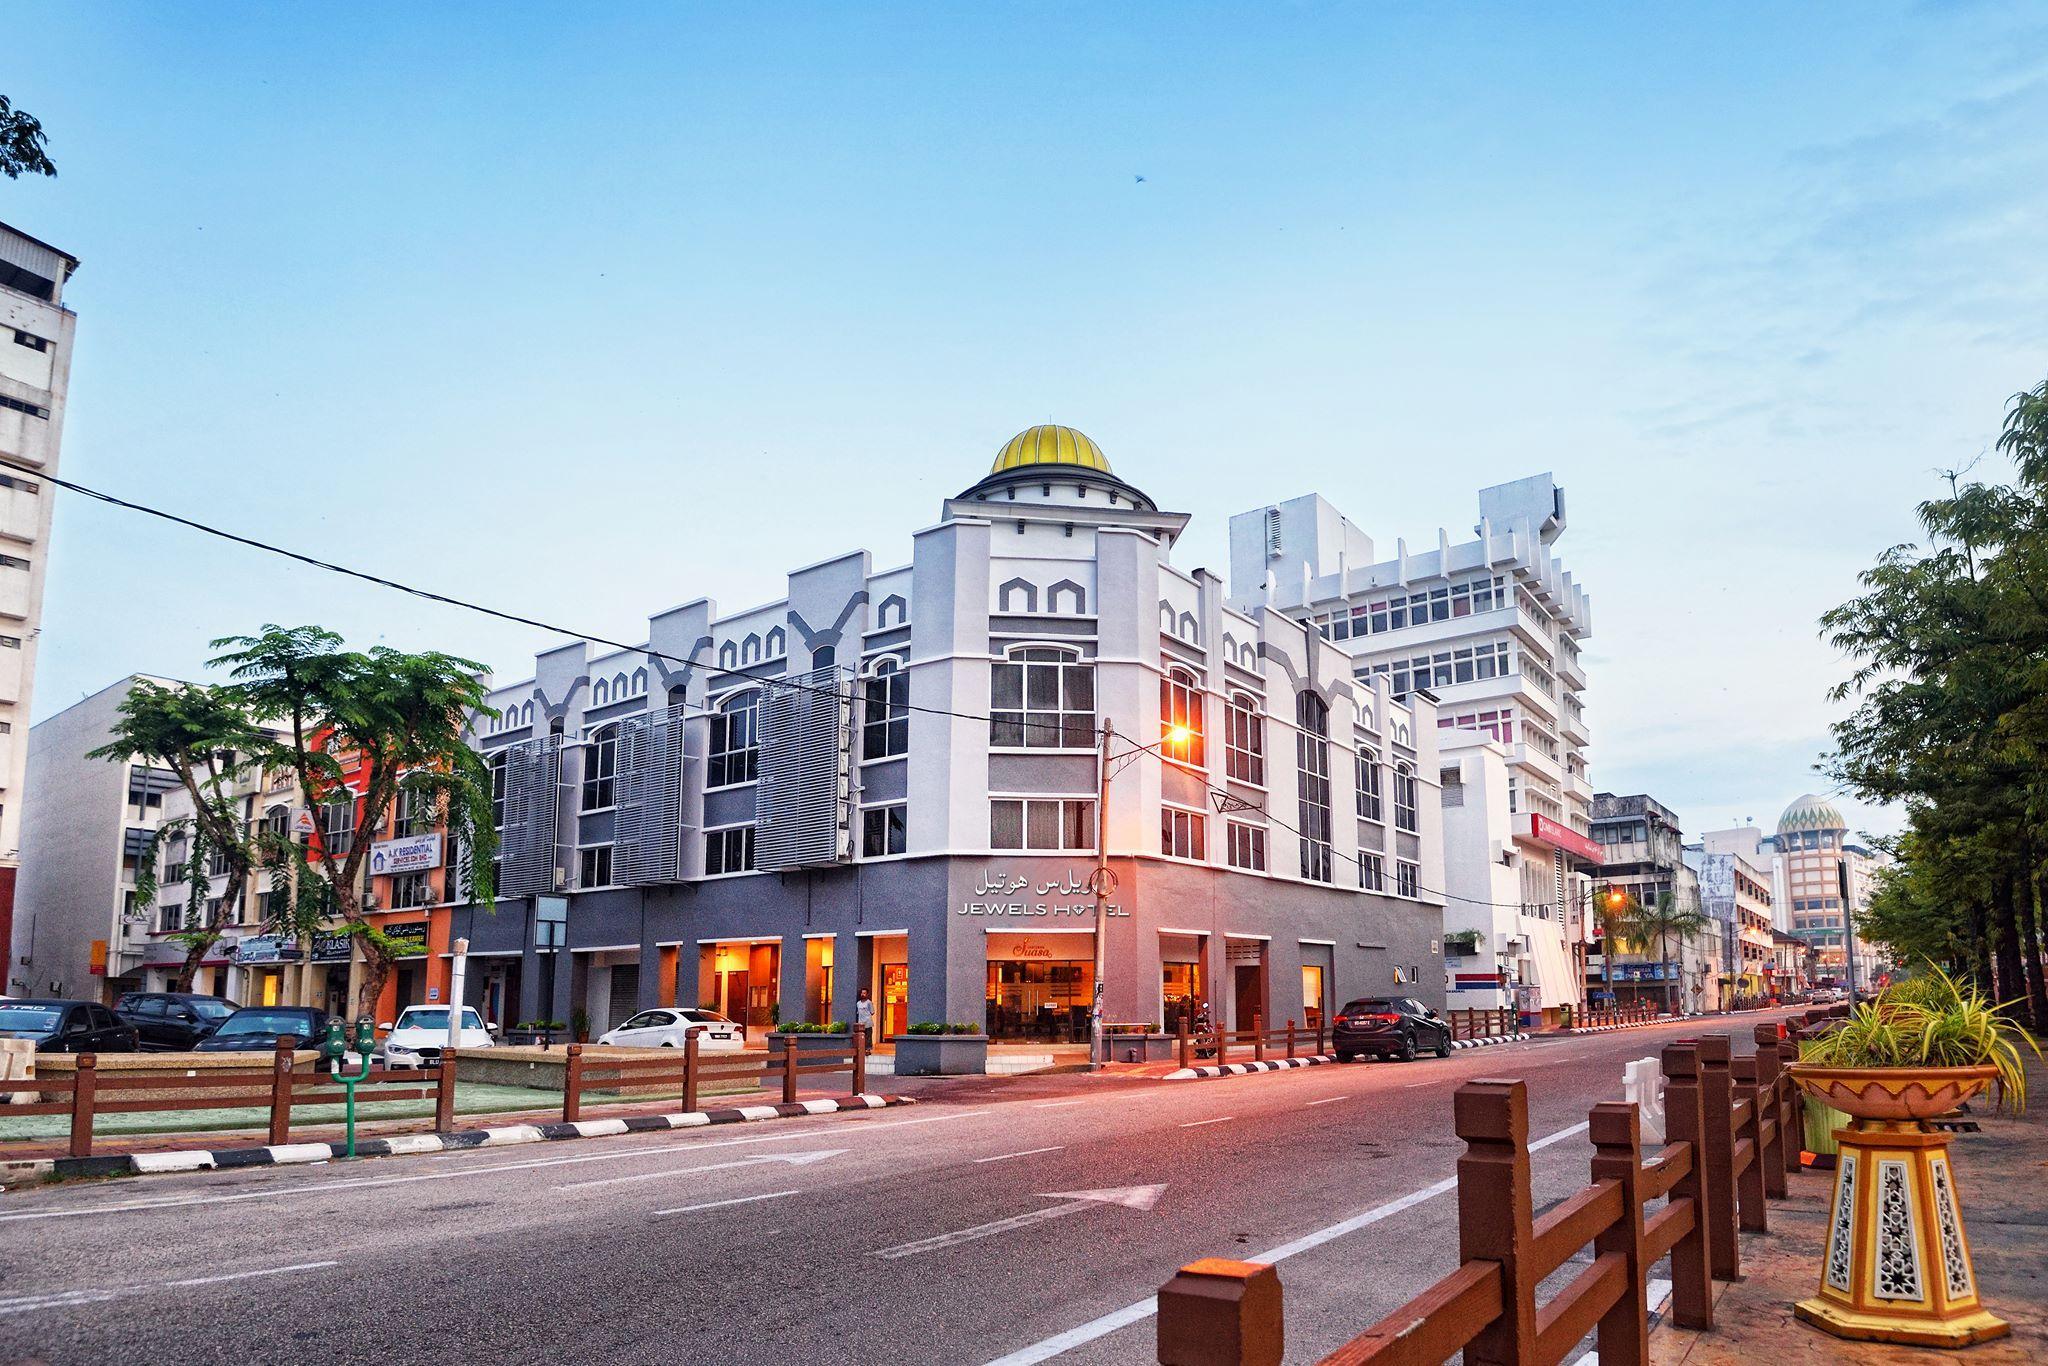 Jewels Hotel, Kota Bharu